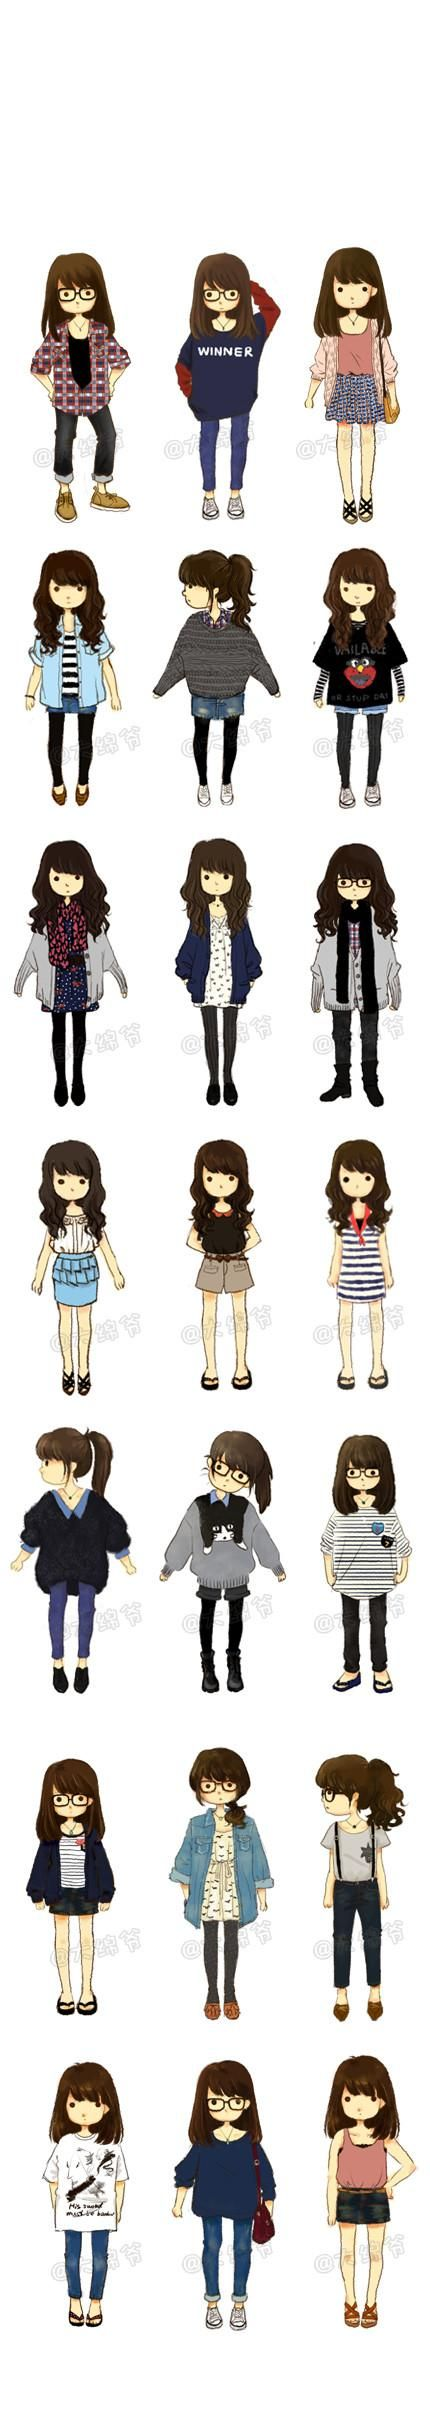 Illustrator นั่งมีฤดูกาลที่สดใหม่ขนาดเล็กที่มี  น้องสาวของ Hao 萌  ผู้เขียนหัวข้อ:  Cute and look easy enough to try or even sew urself